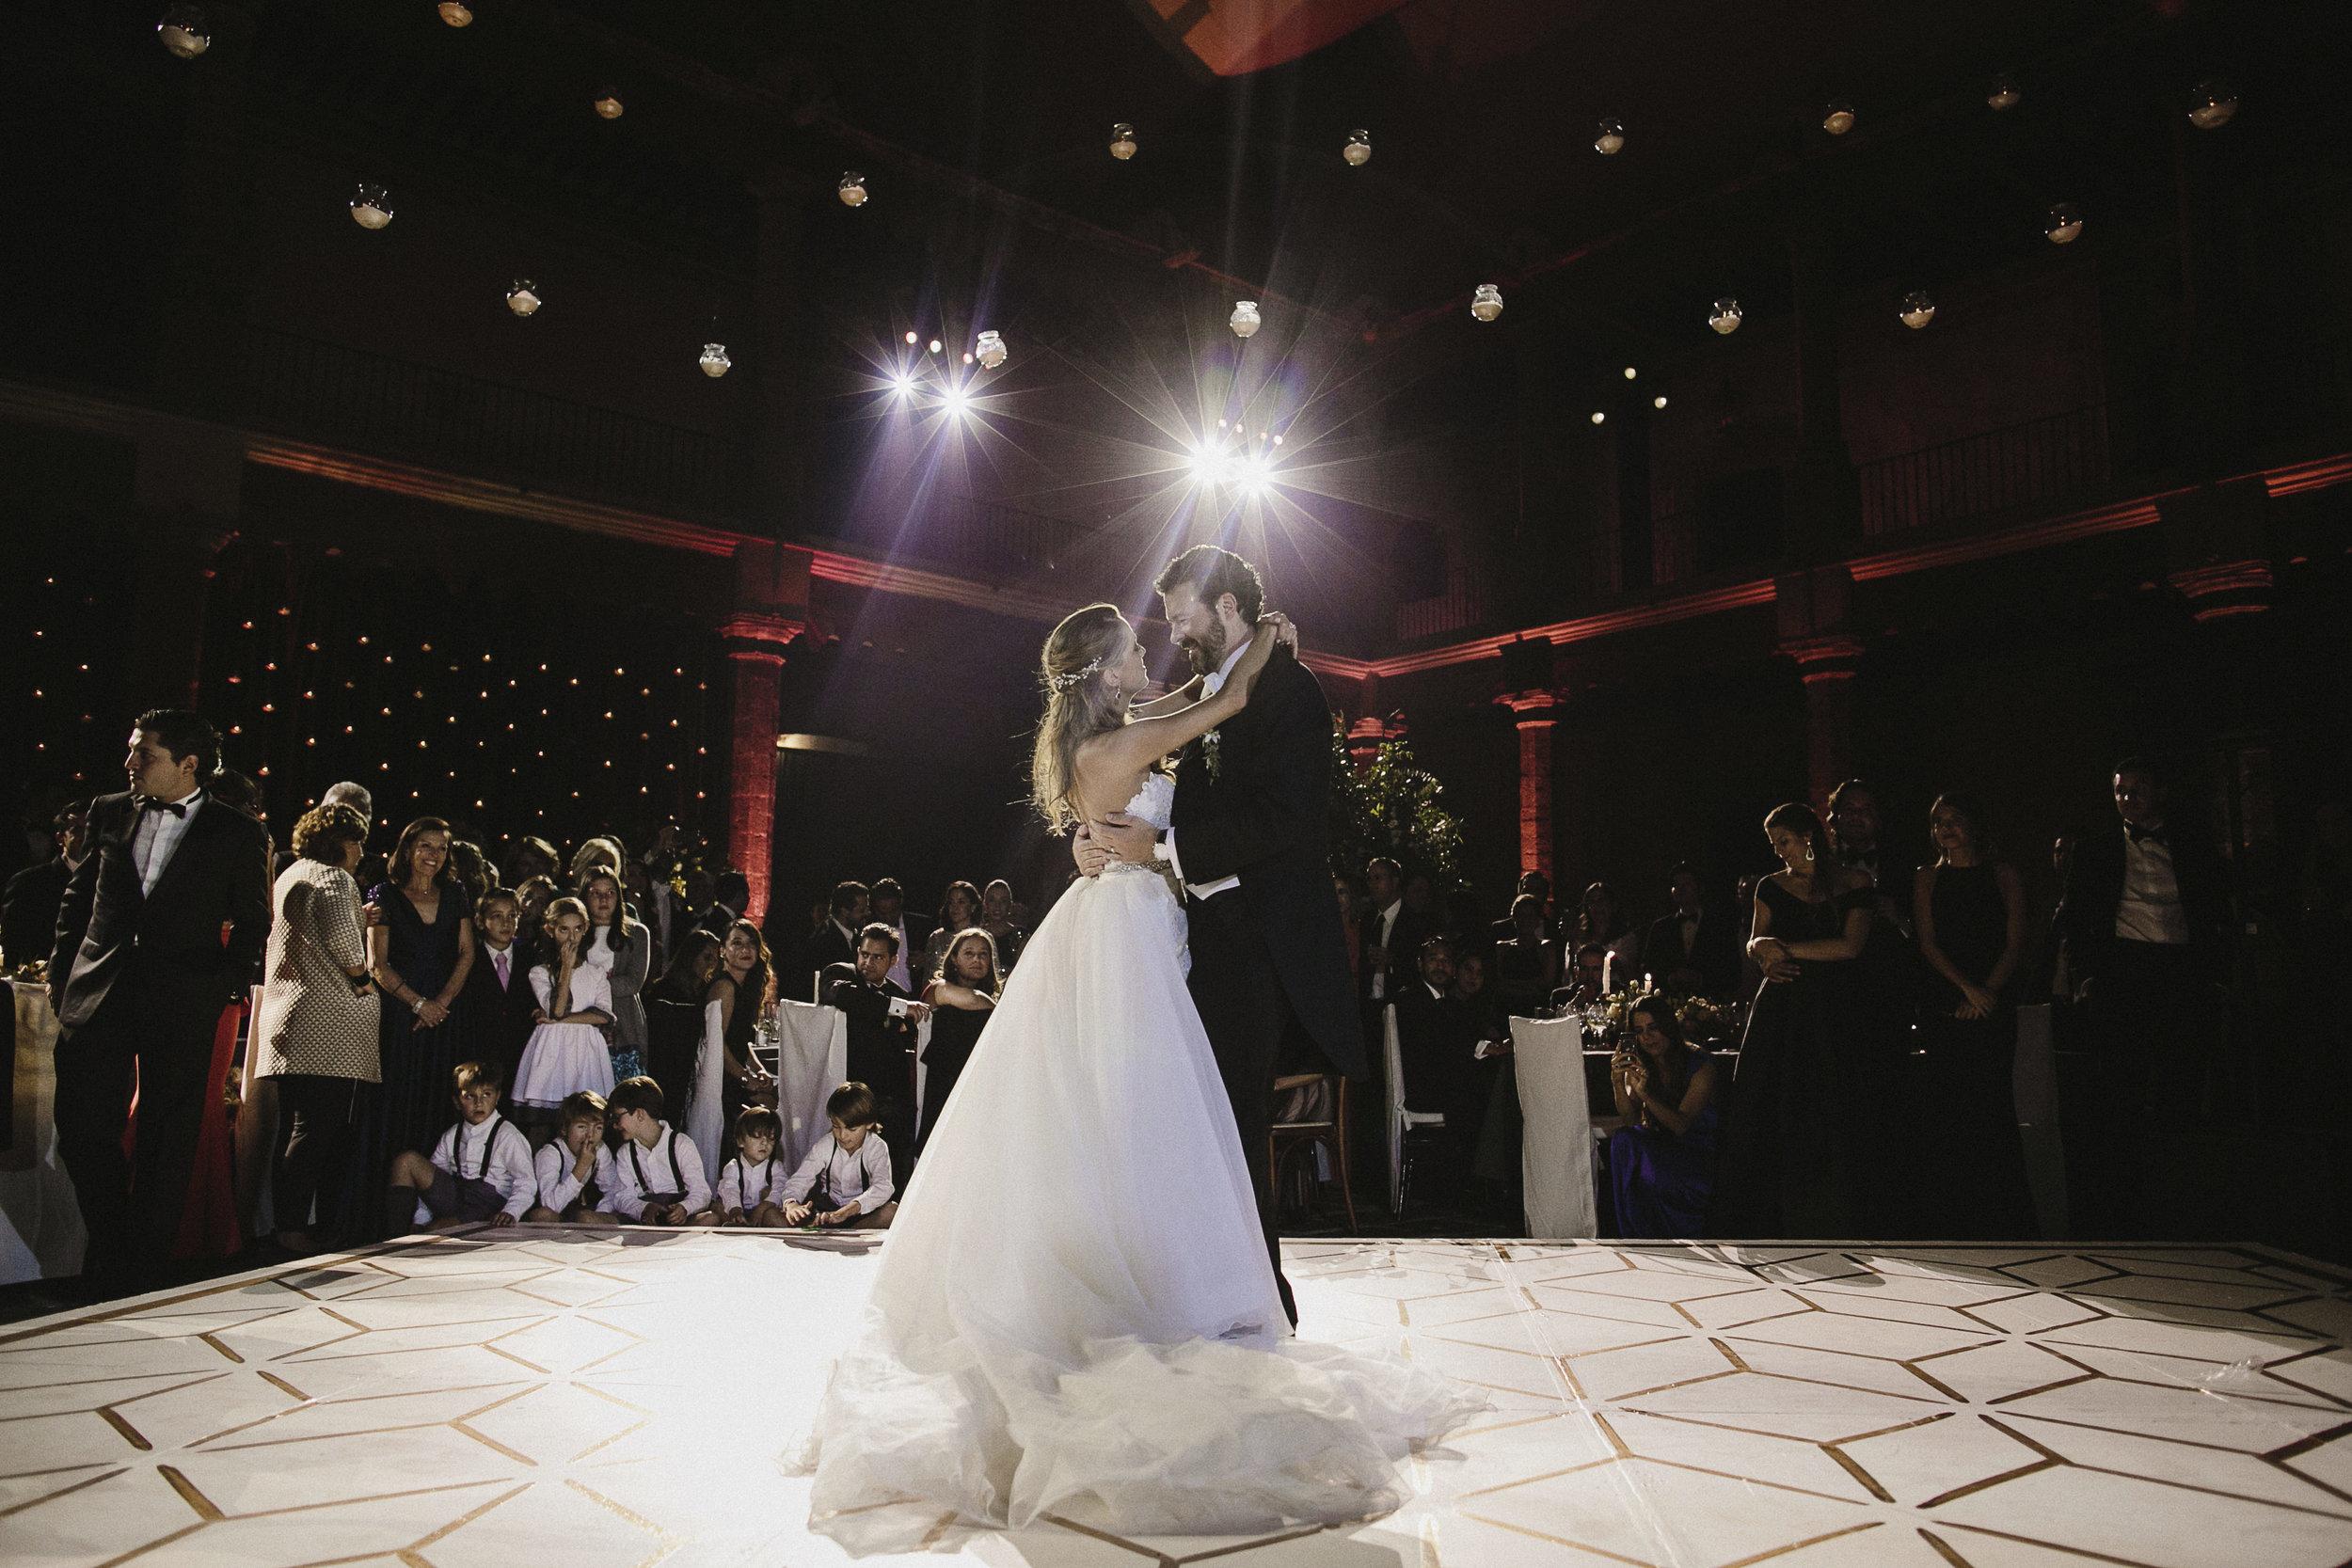 alfonso_flores_destination_wedding_photogrpahy_paola_alonso-959.JPG